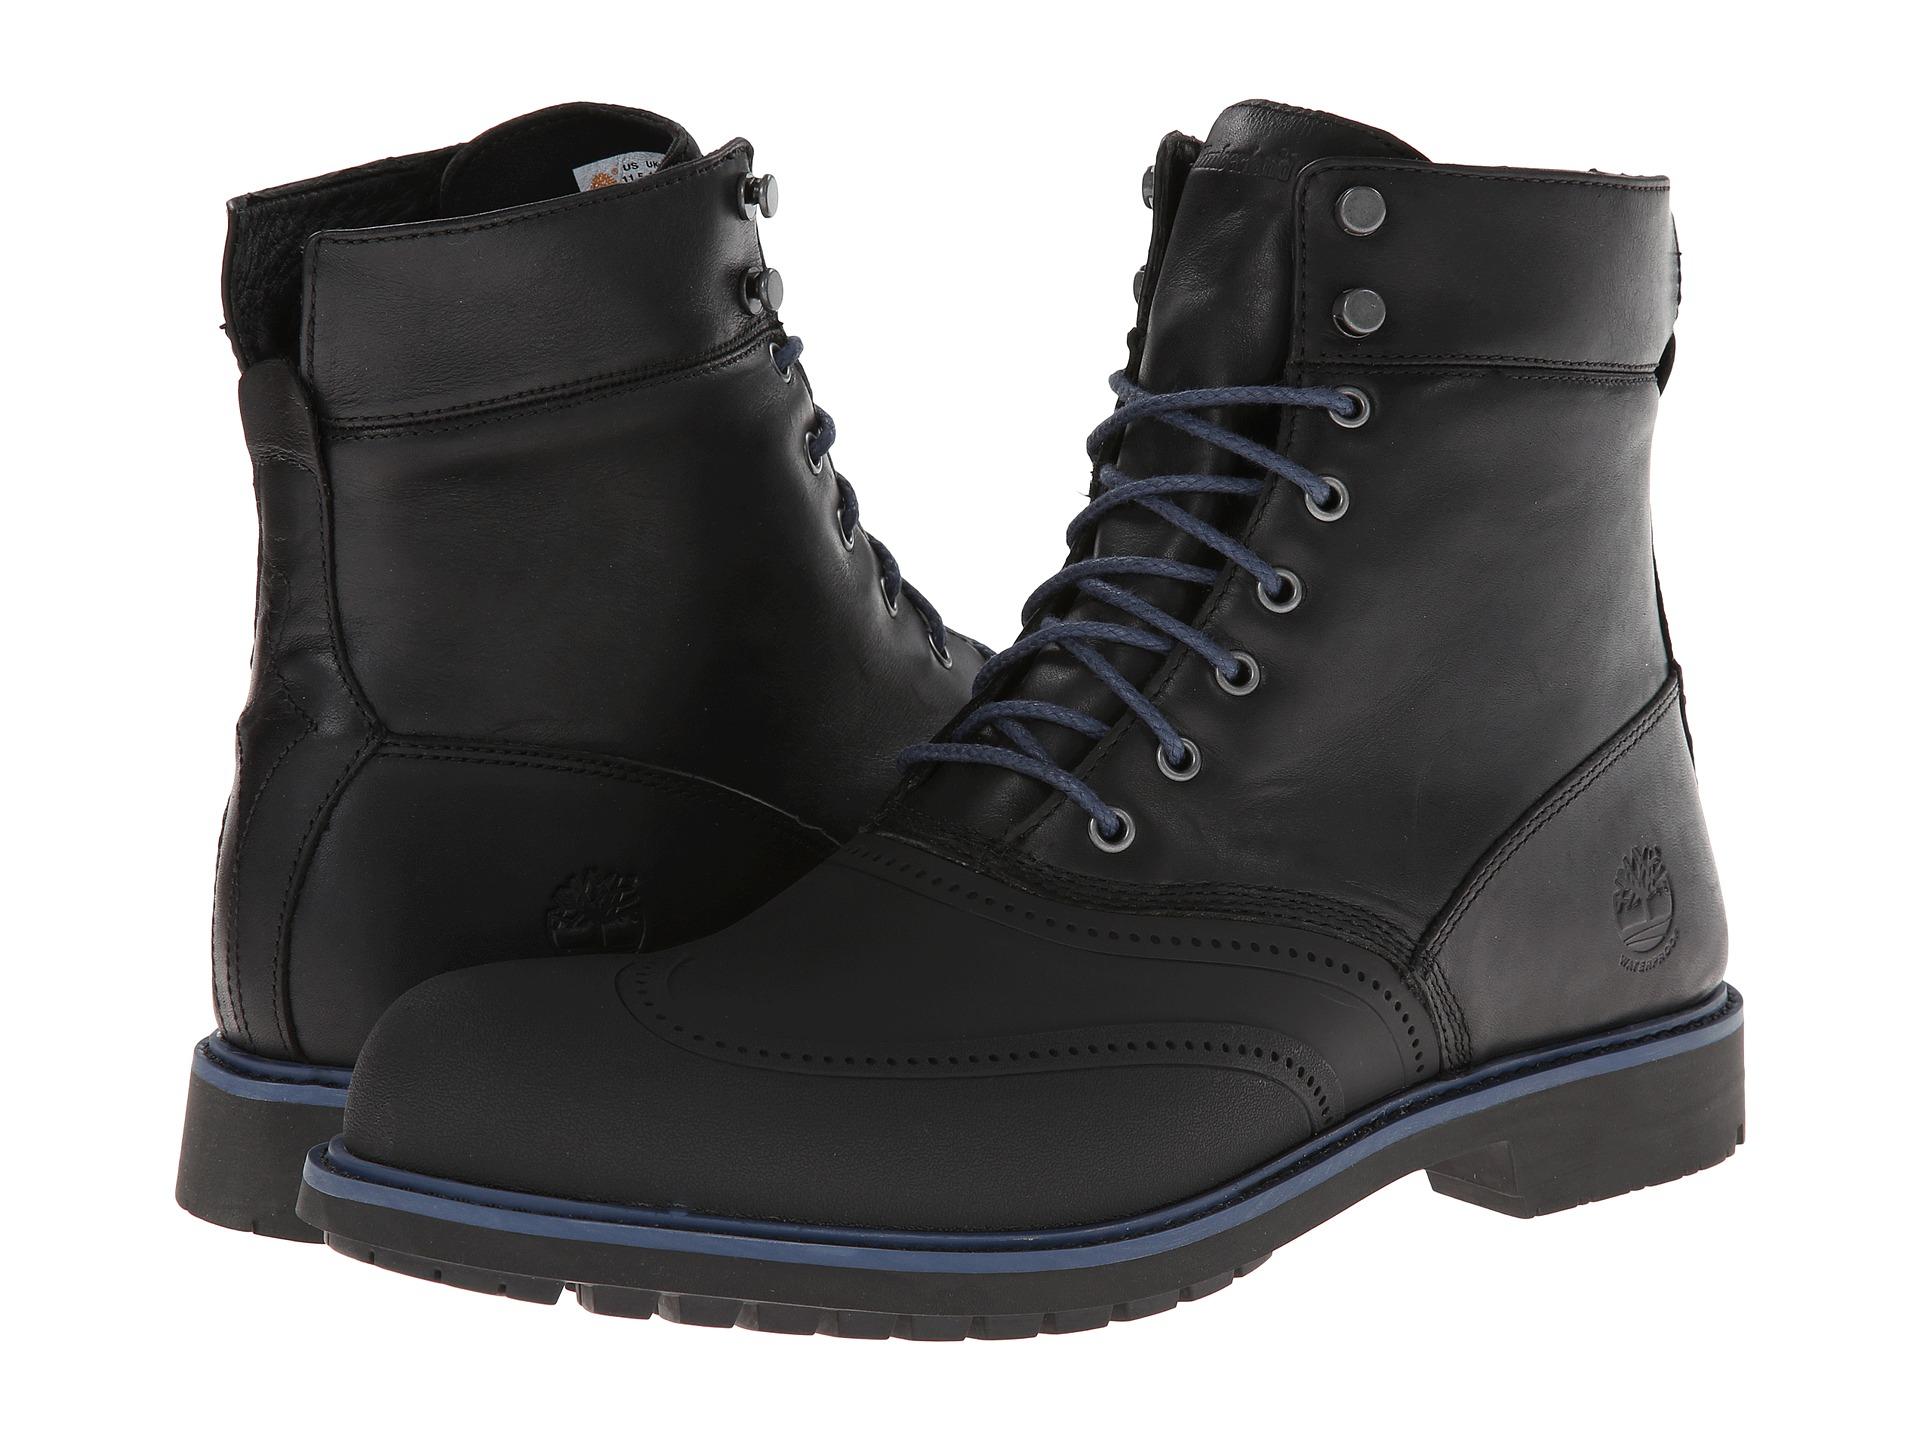 timberland earthkeepers stormbuck chukka ankle boots